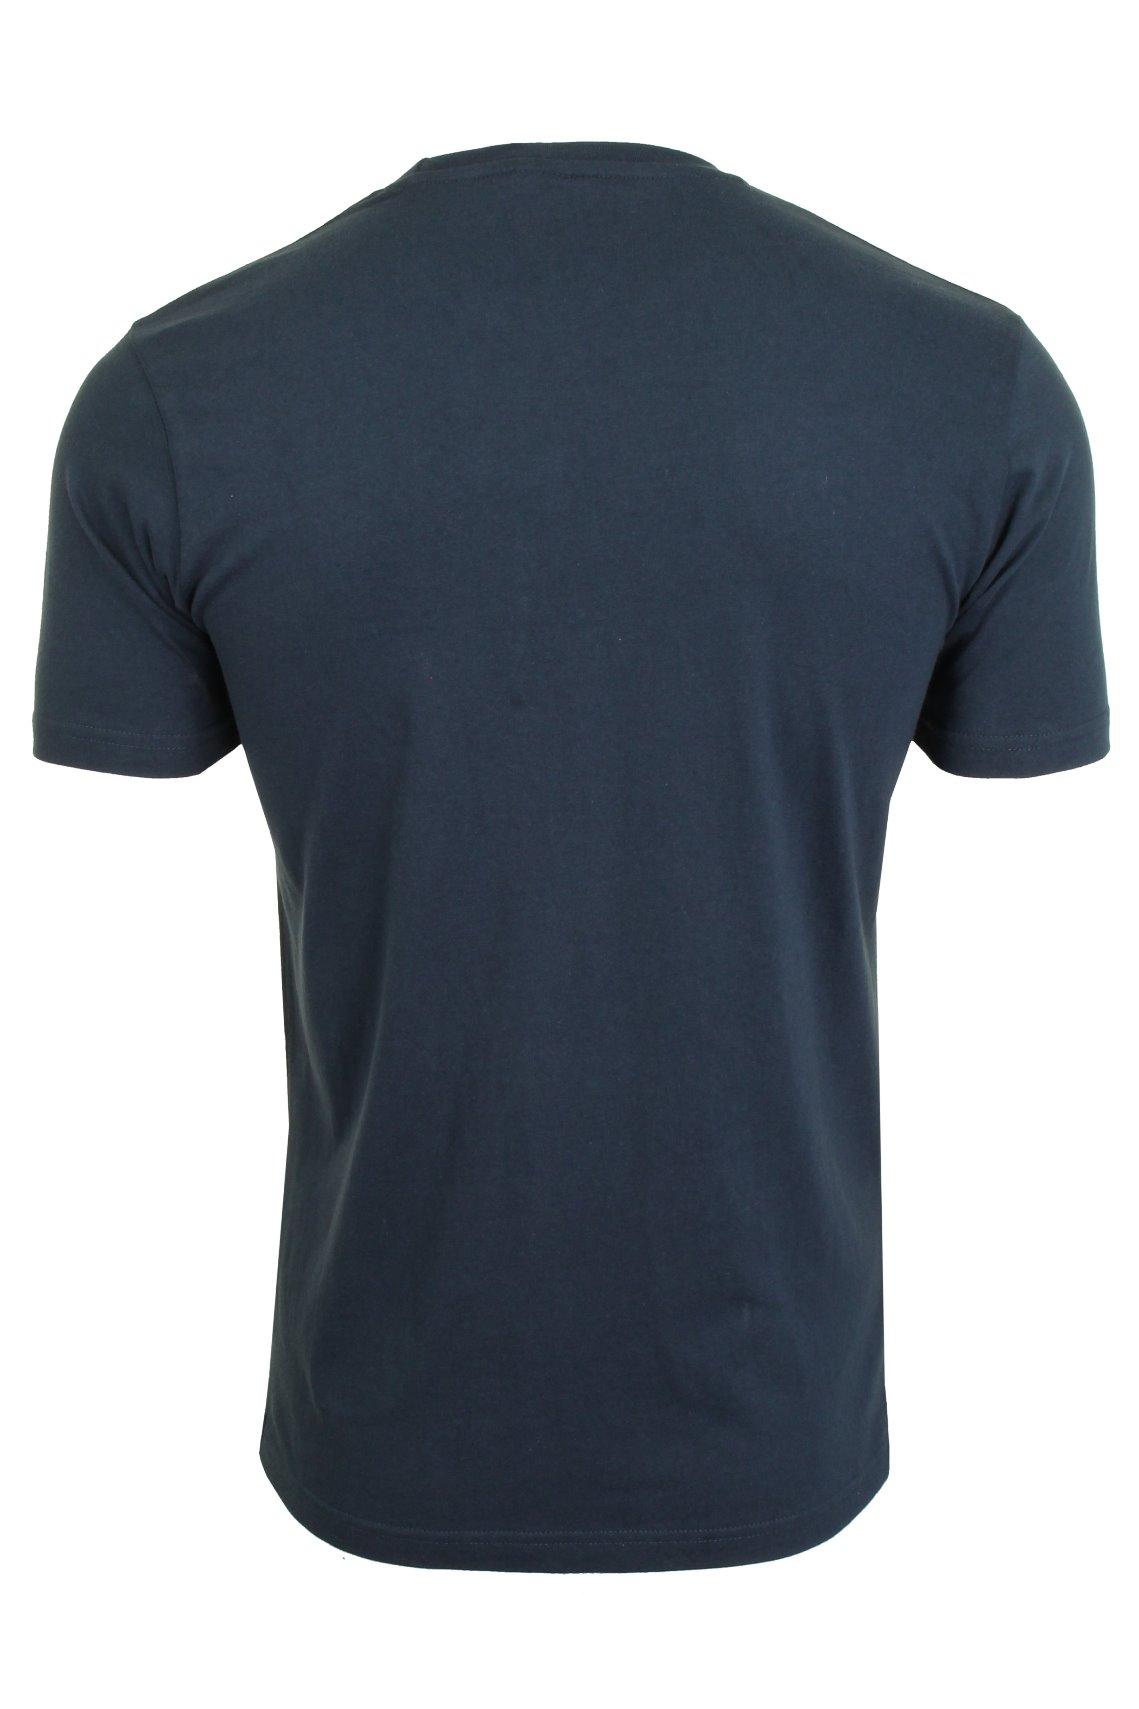 Para-Hombre-Ellesse-Camiseta-de-manga-corta-039-Canaletto-034 miniatura 11